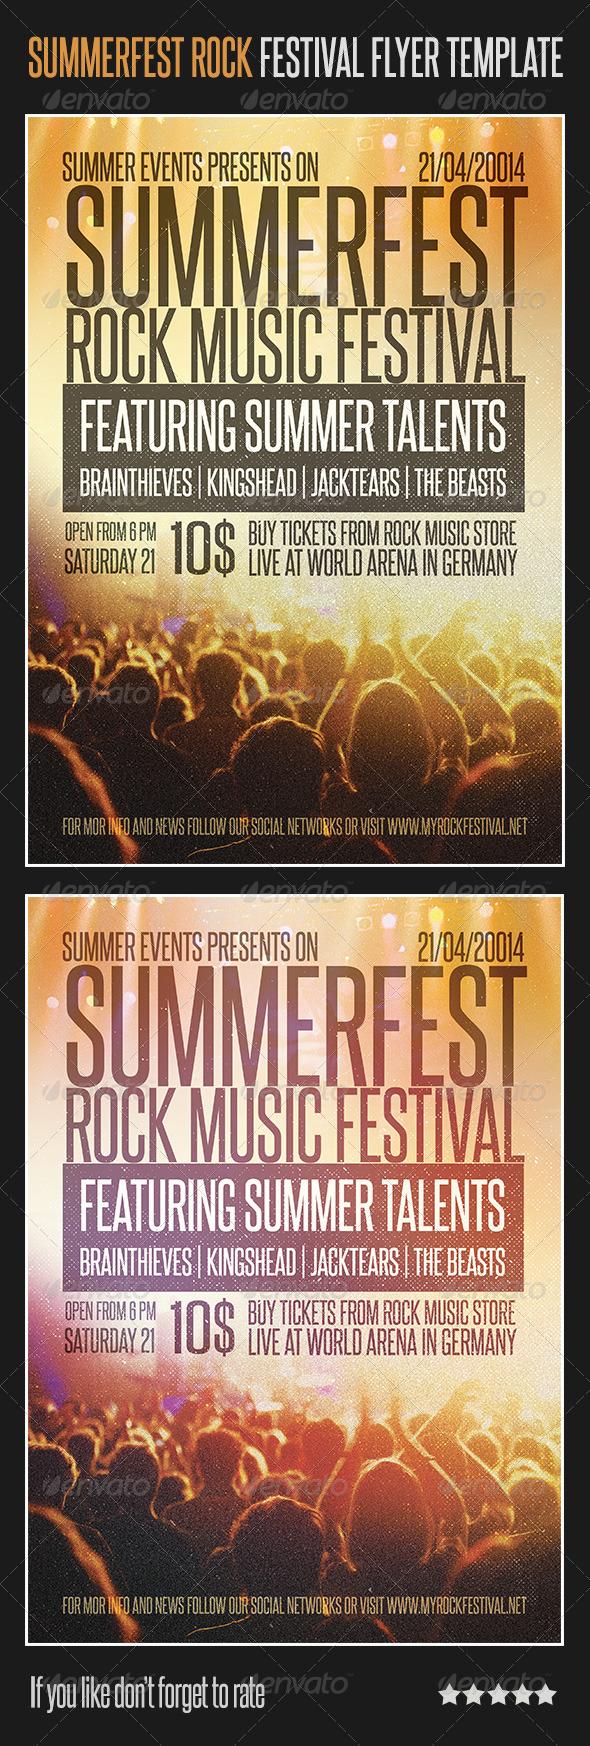 Summerfest Rock Festival Flyer Template - Concerts Events